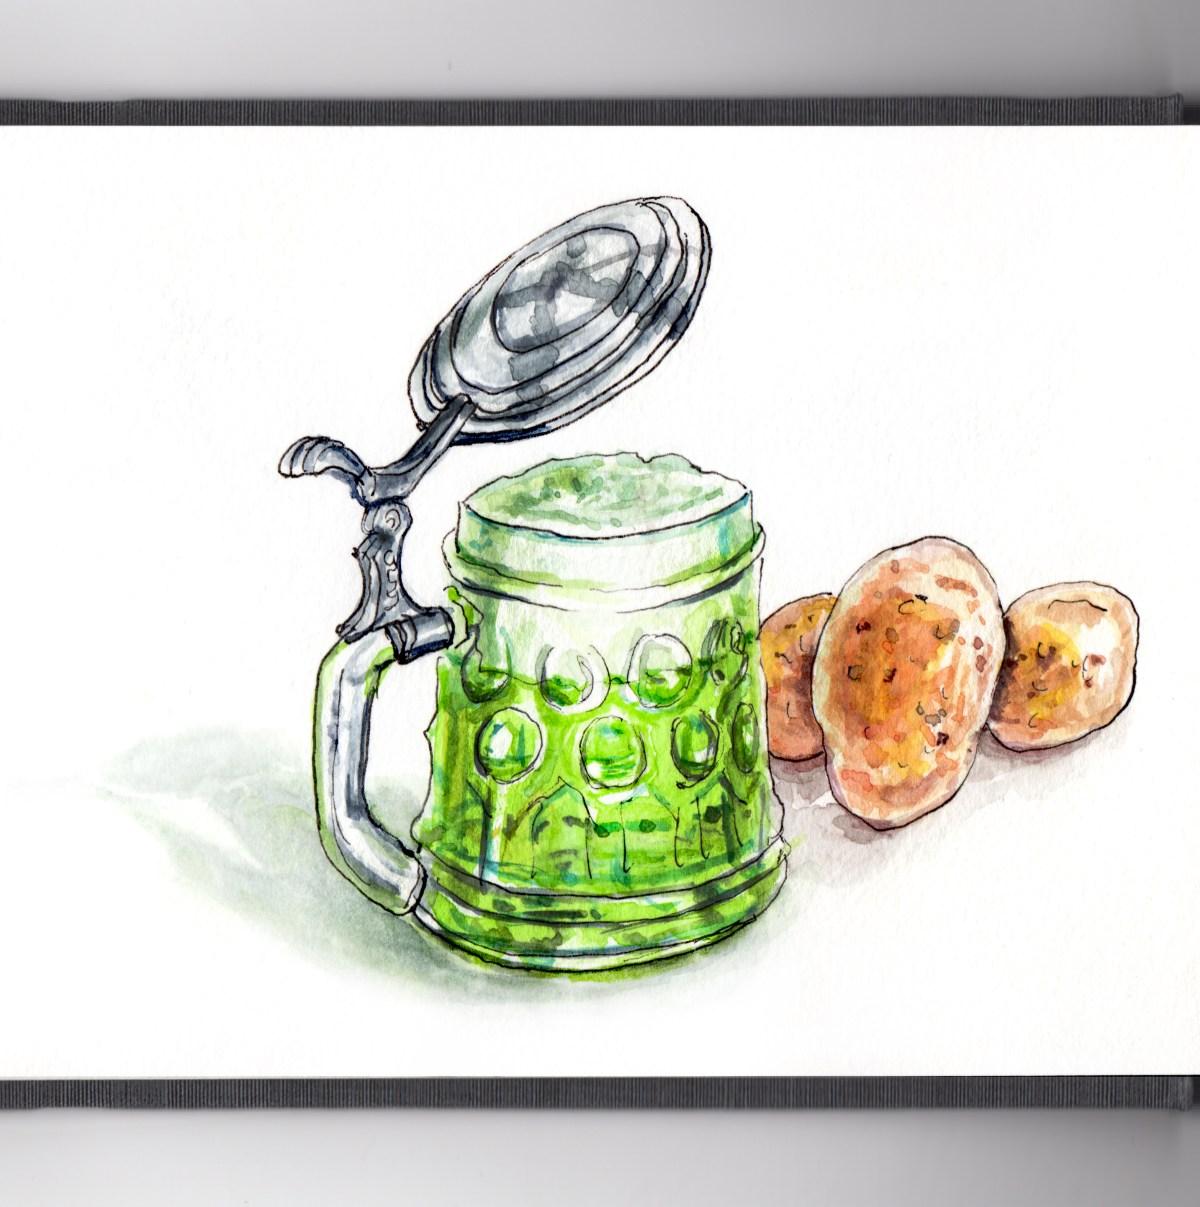 Day 17 - #WorldWatercolorGroup - Green Beer and Potatoes Mood - #doodlewash